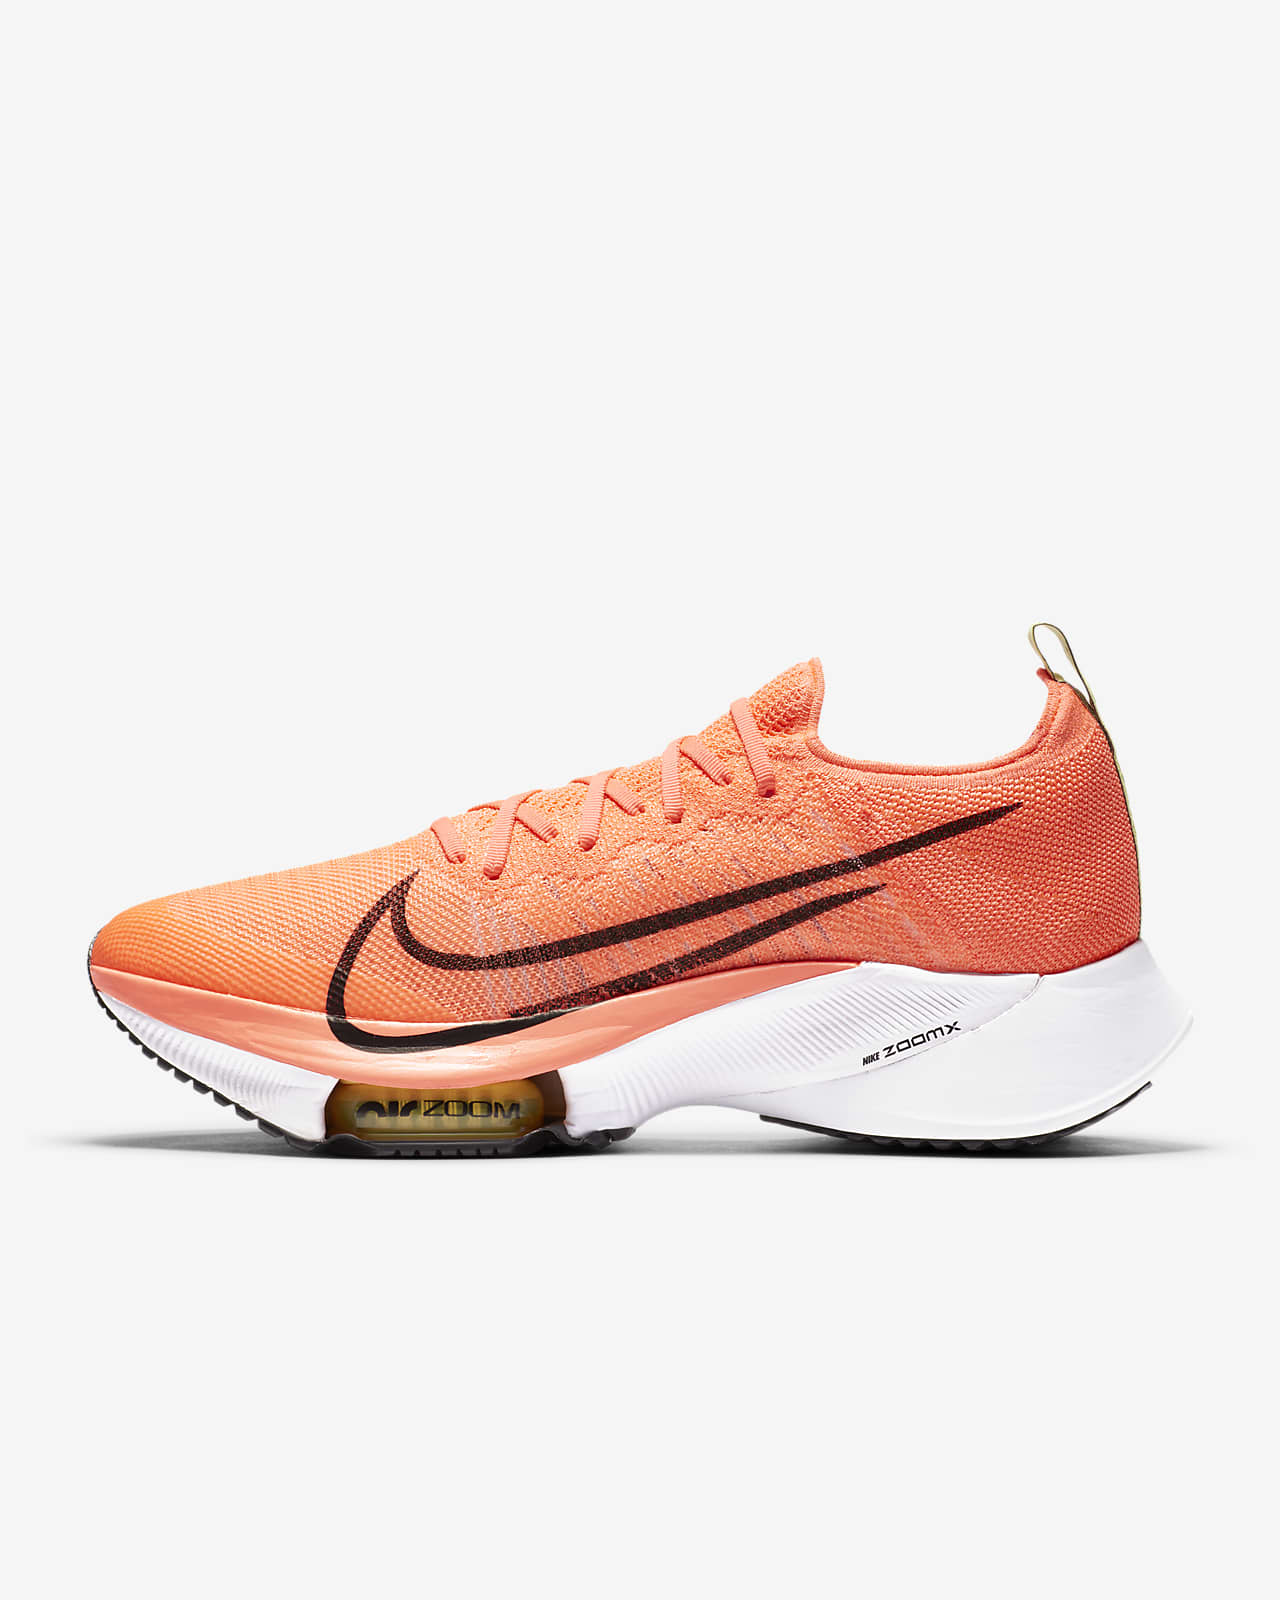 Nike Air Zoom Tempo NEXT% férfi futócipő